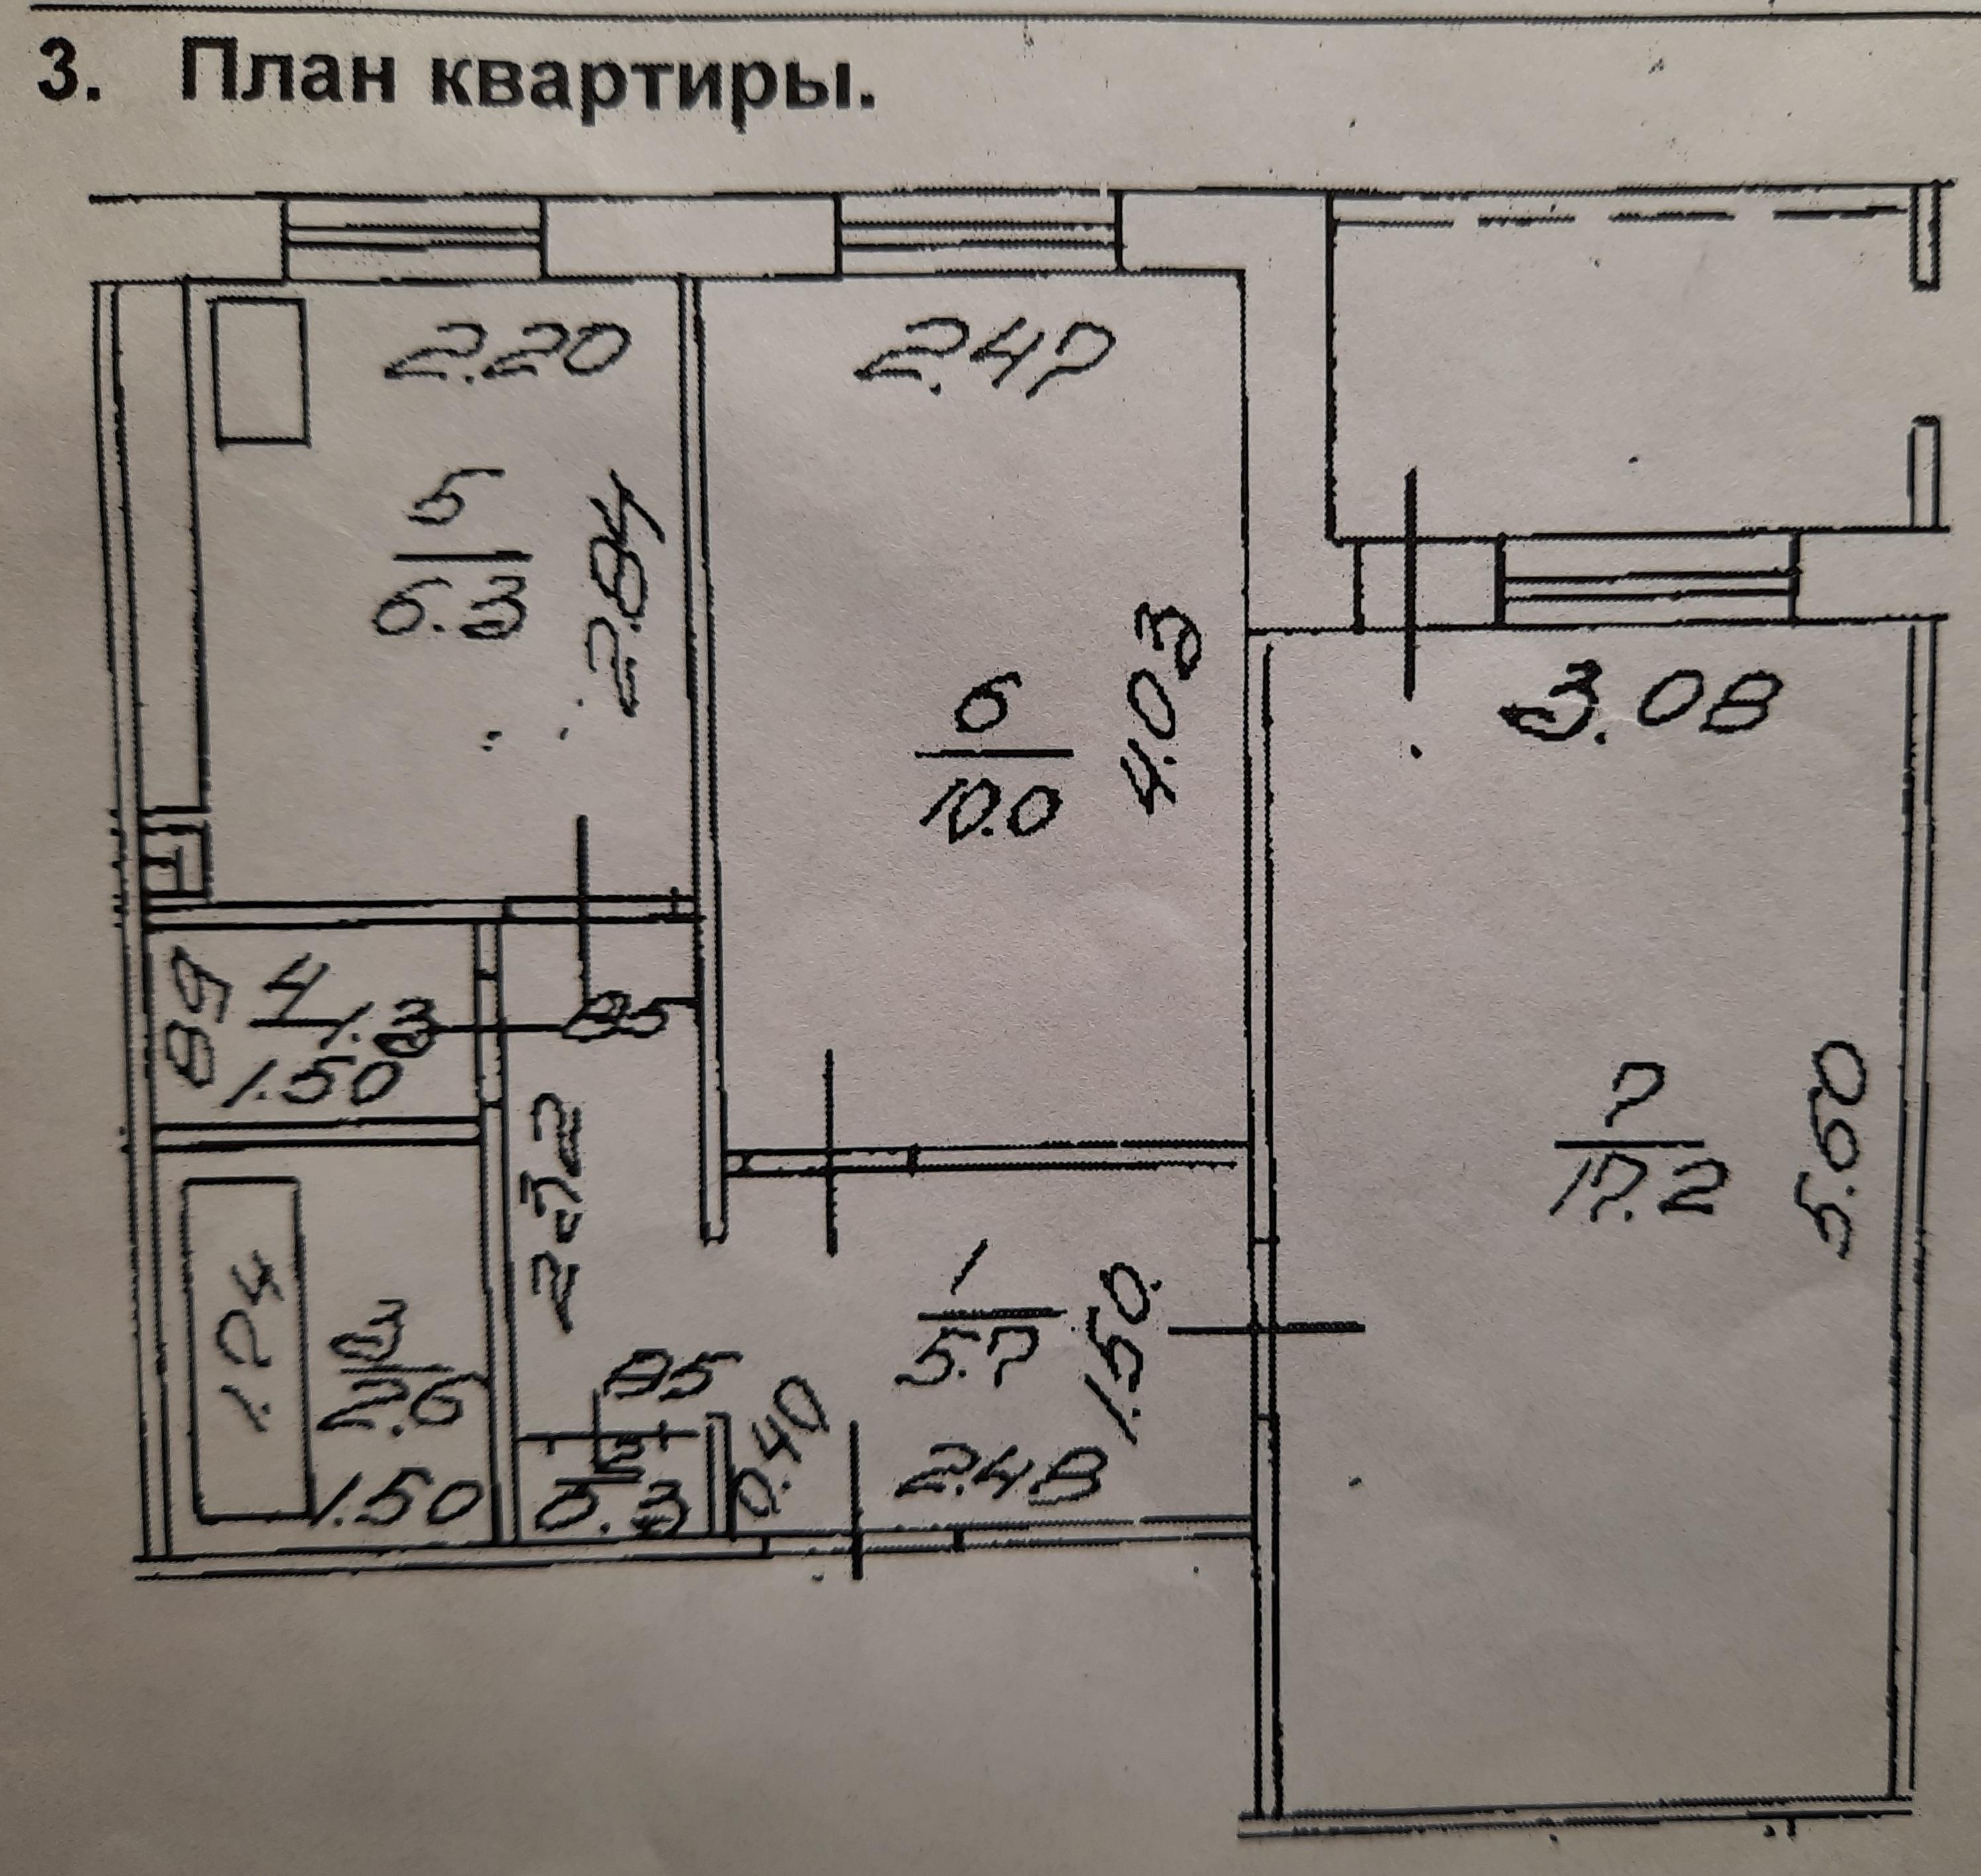 2-х комнатная квартира в микрорайоне Сипайлово